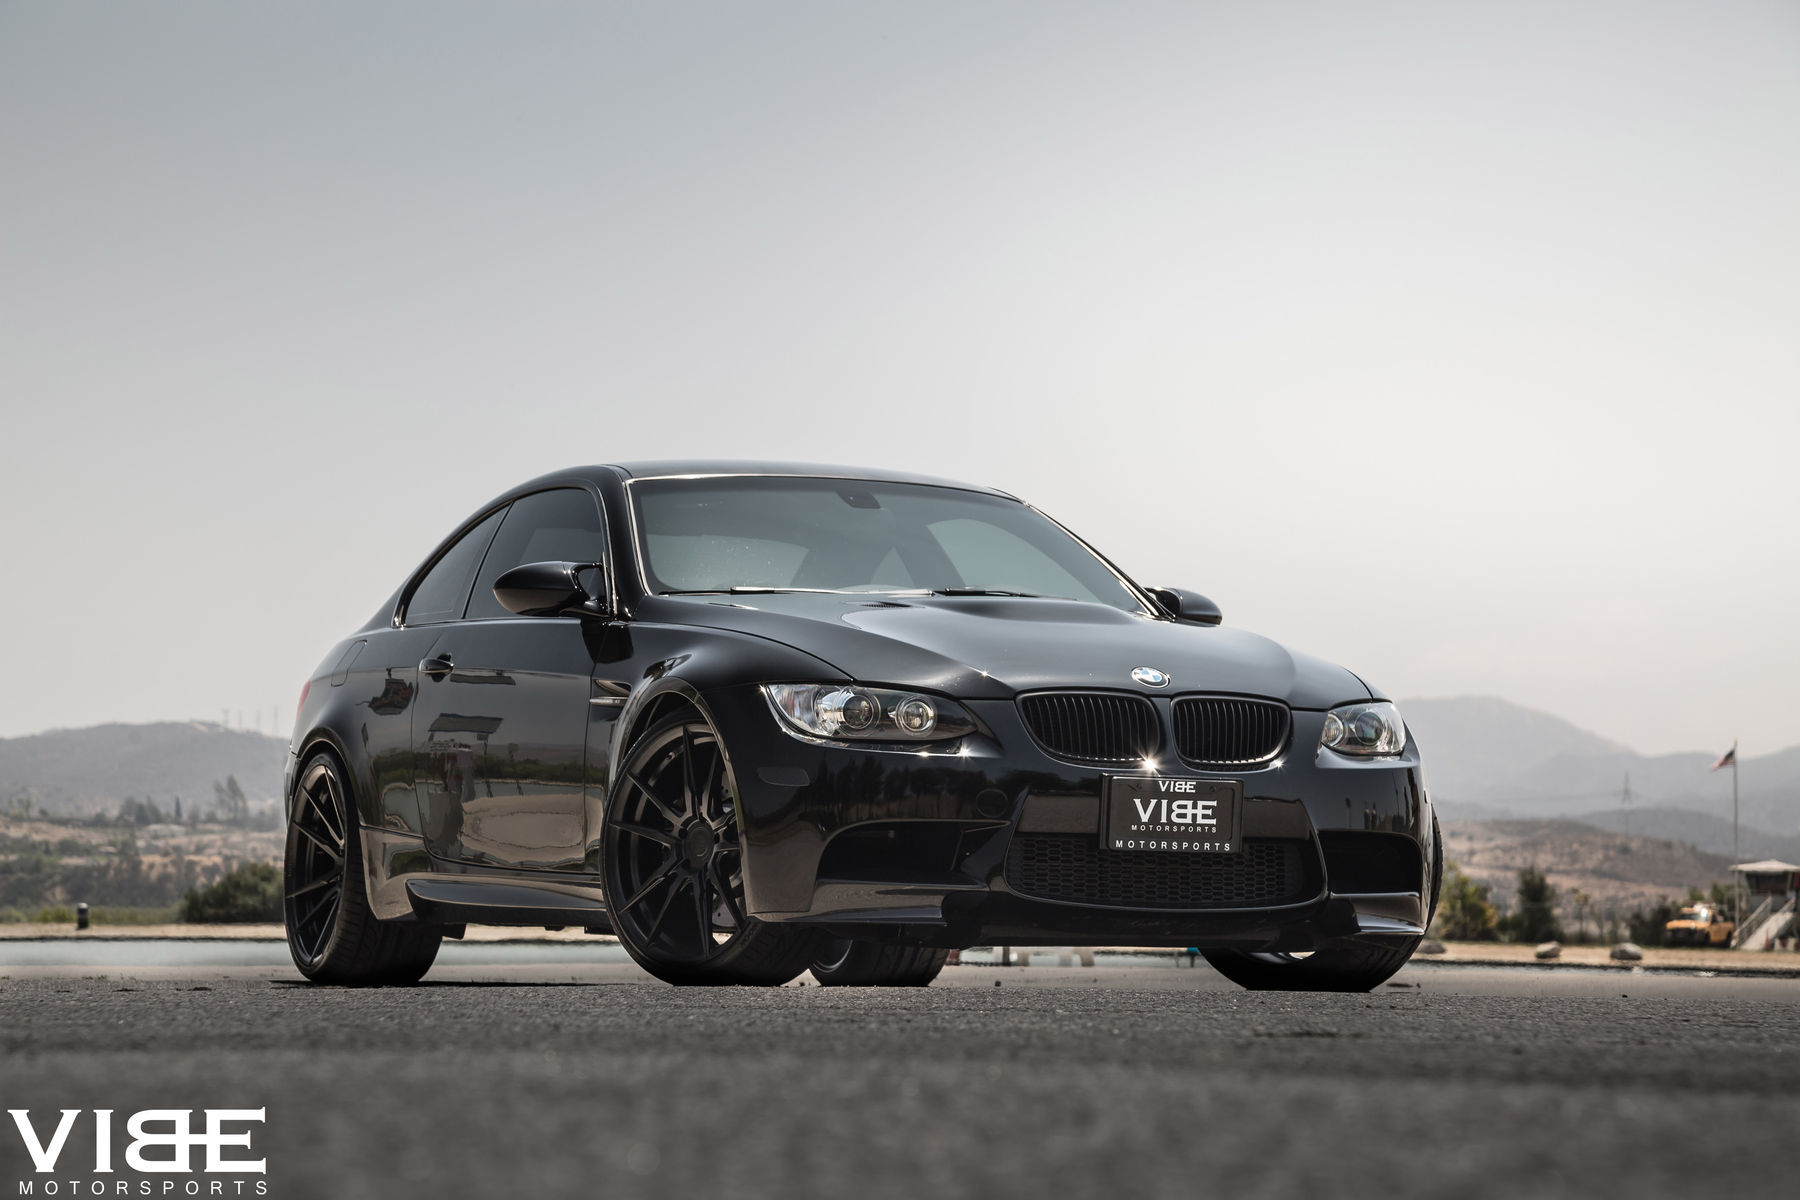 2012 BMW M3   '12 E92 M3 on Rohana 20's - Iconic